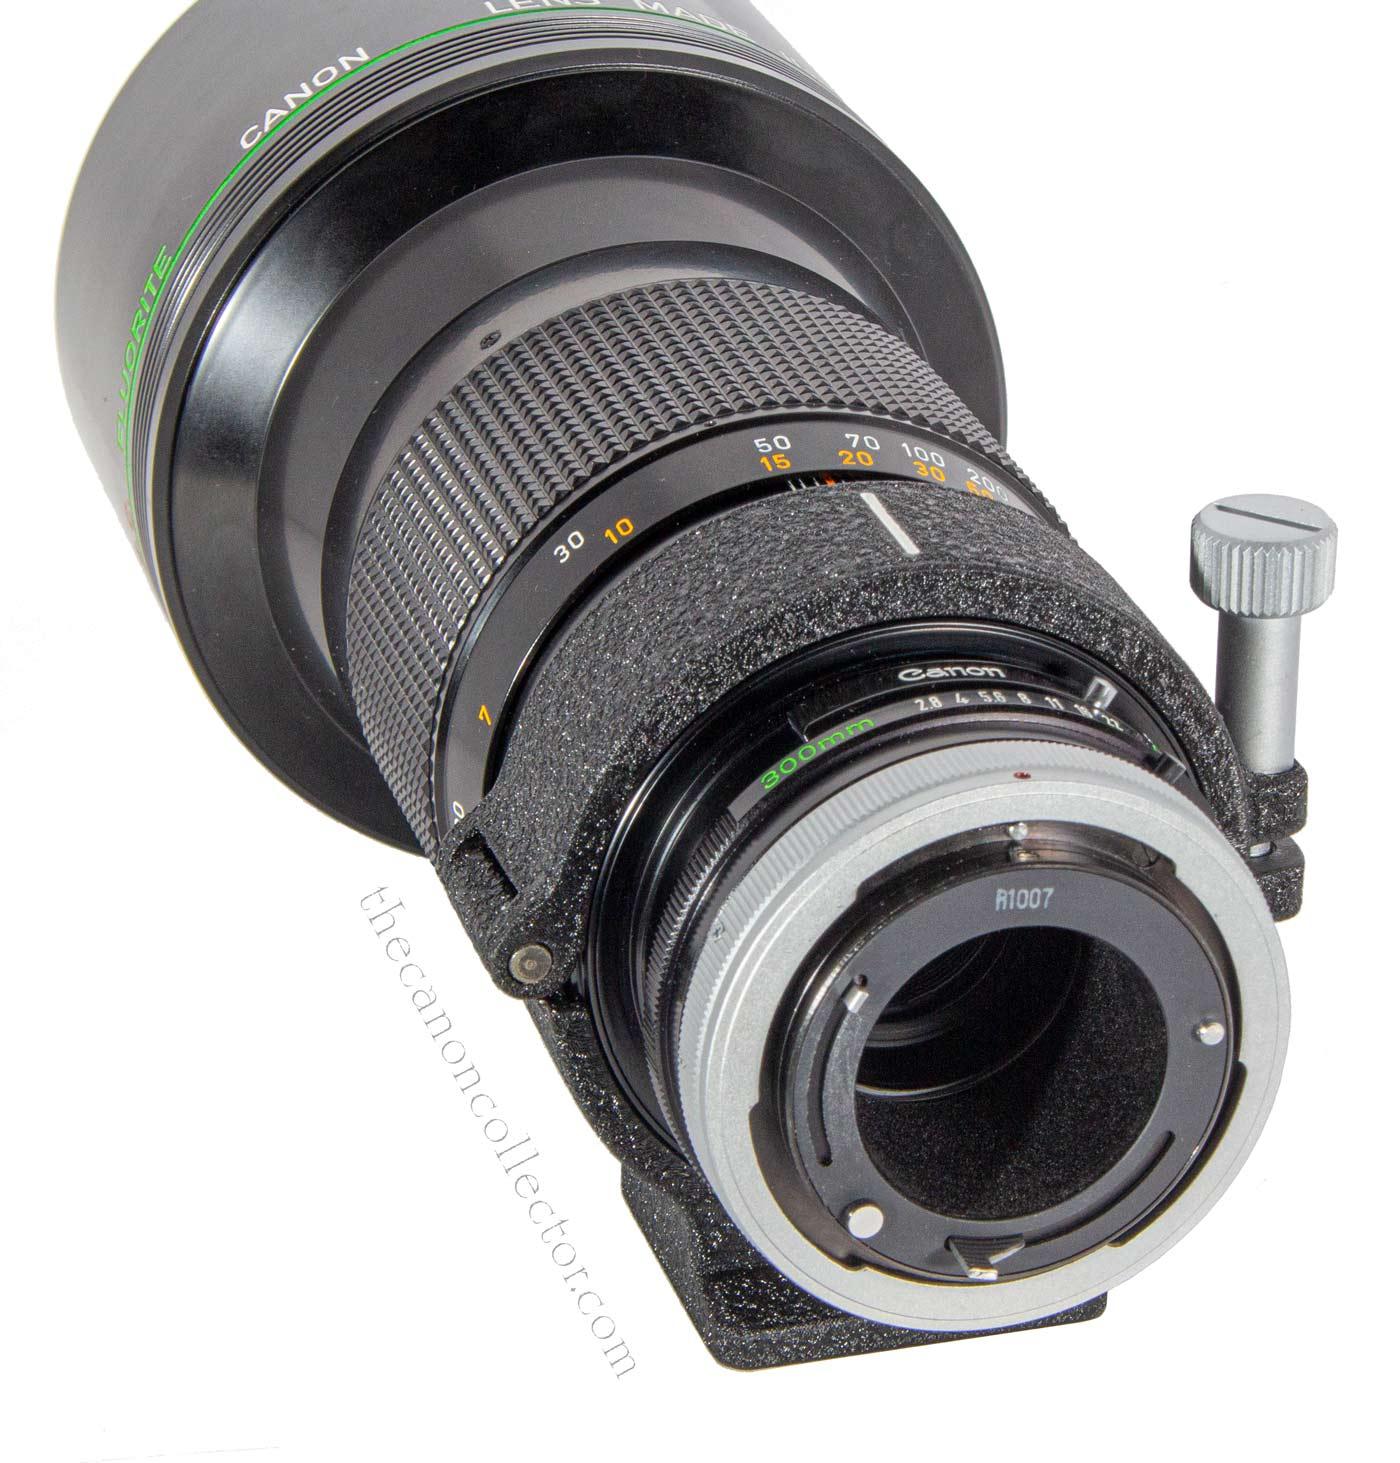 Canon FD 300mm f/2.8 S.S.C. Fluorite Lens